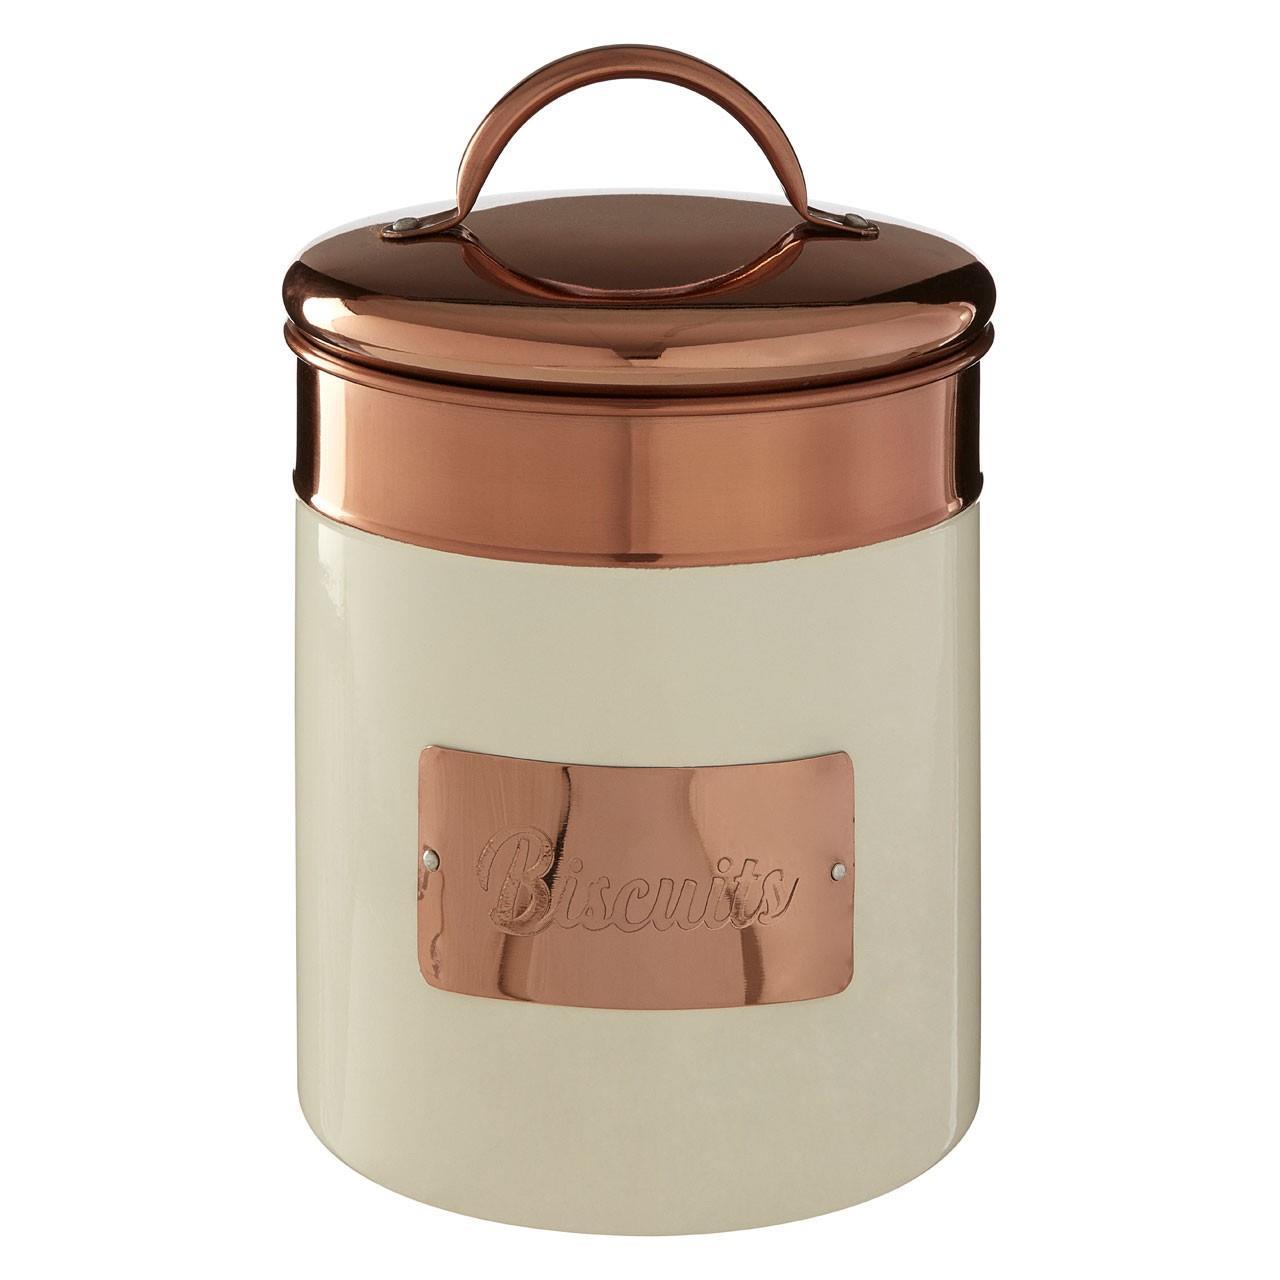 Prescott-Cream-Copper-Bread-Bin-Biscuit-Sugar-Coffee-Canister-Utensil-Holder thumbnail 9